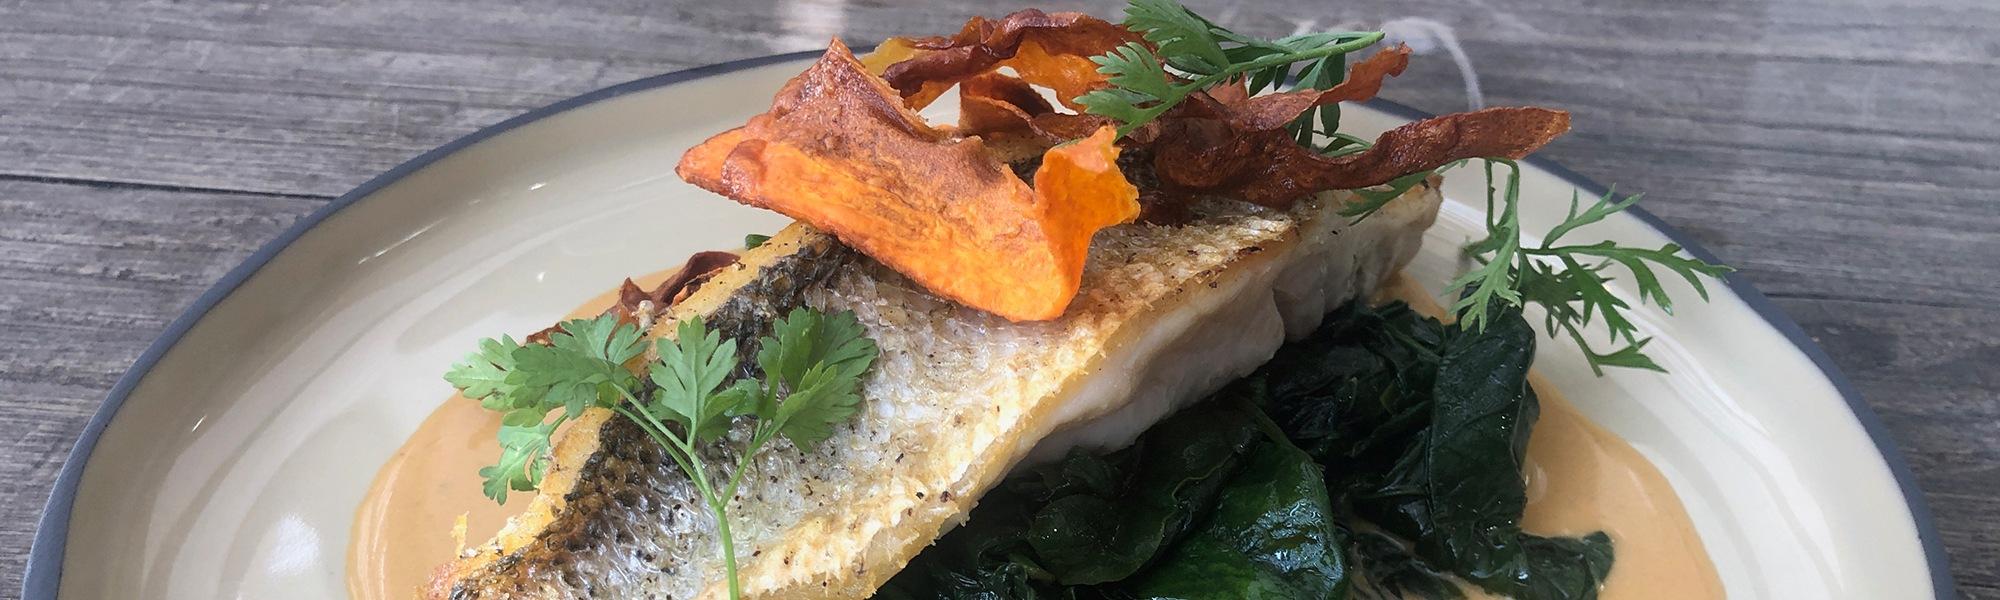 Les Q Salés - plat de poisson